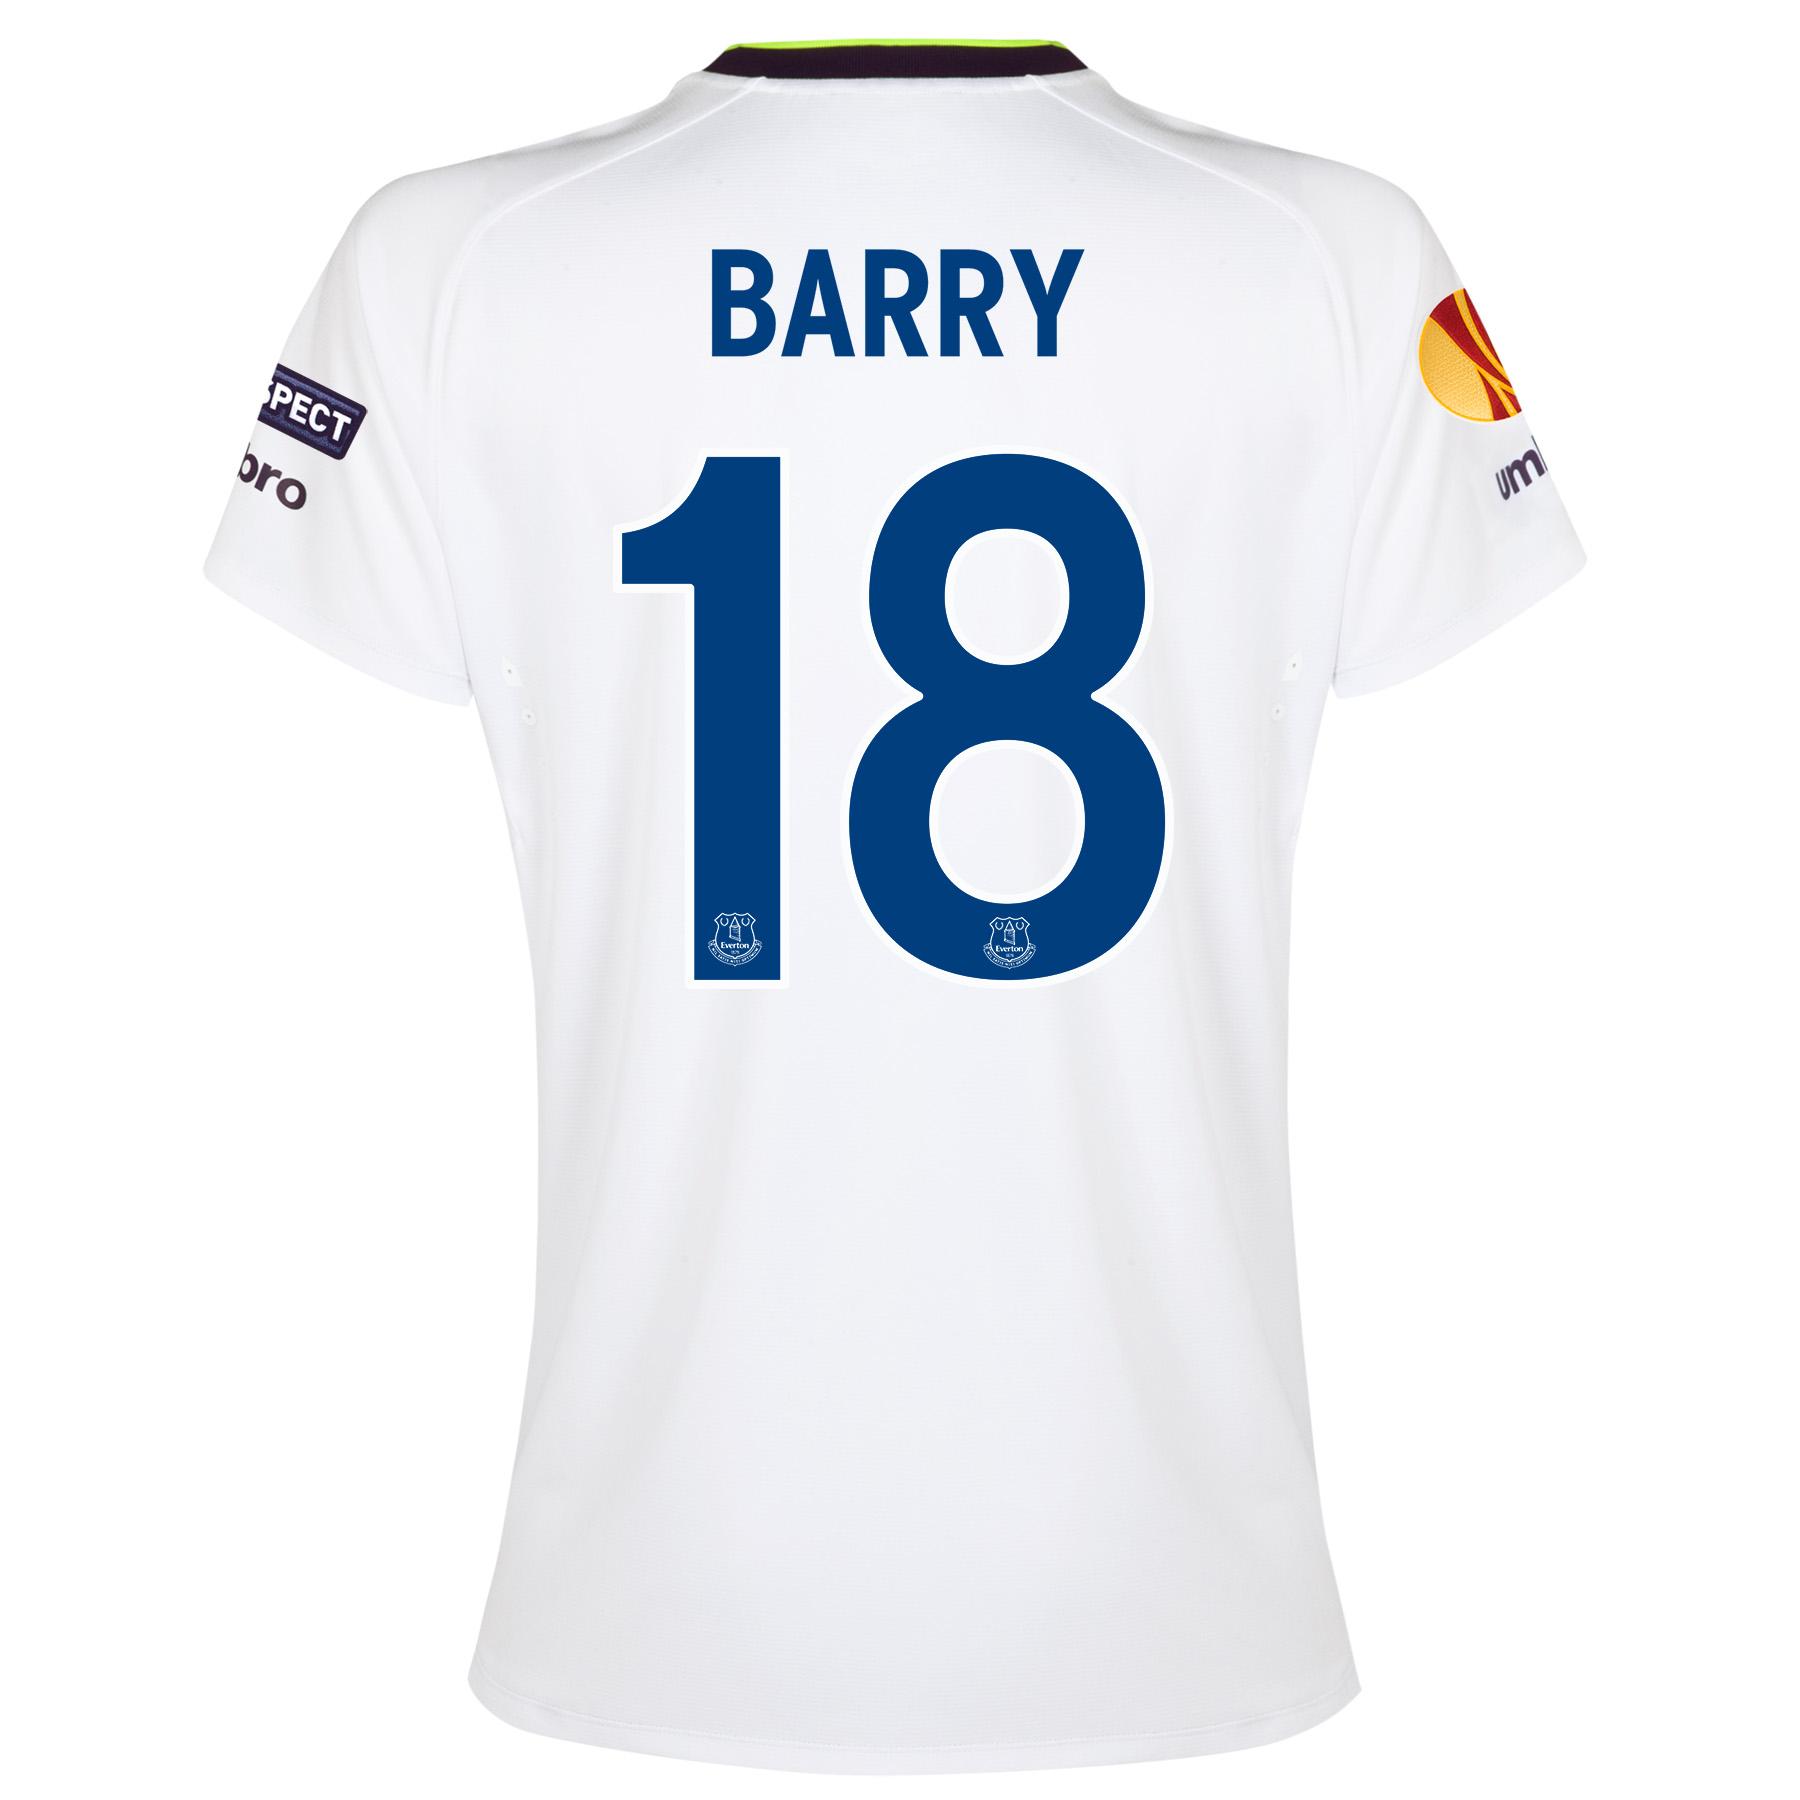 Everton UEFA Europa League 3rd Shirt 2014/15 - Womens with Barry 18 pr